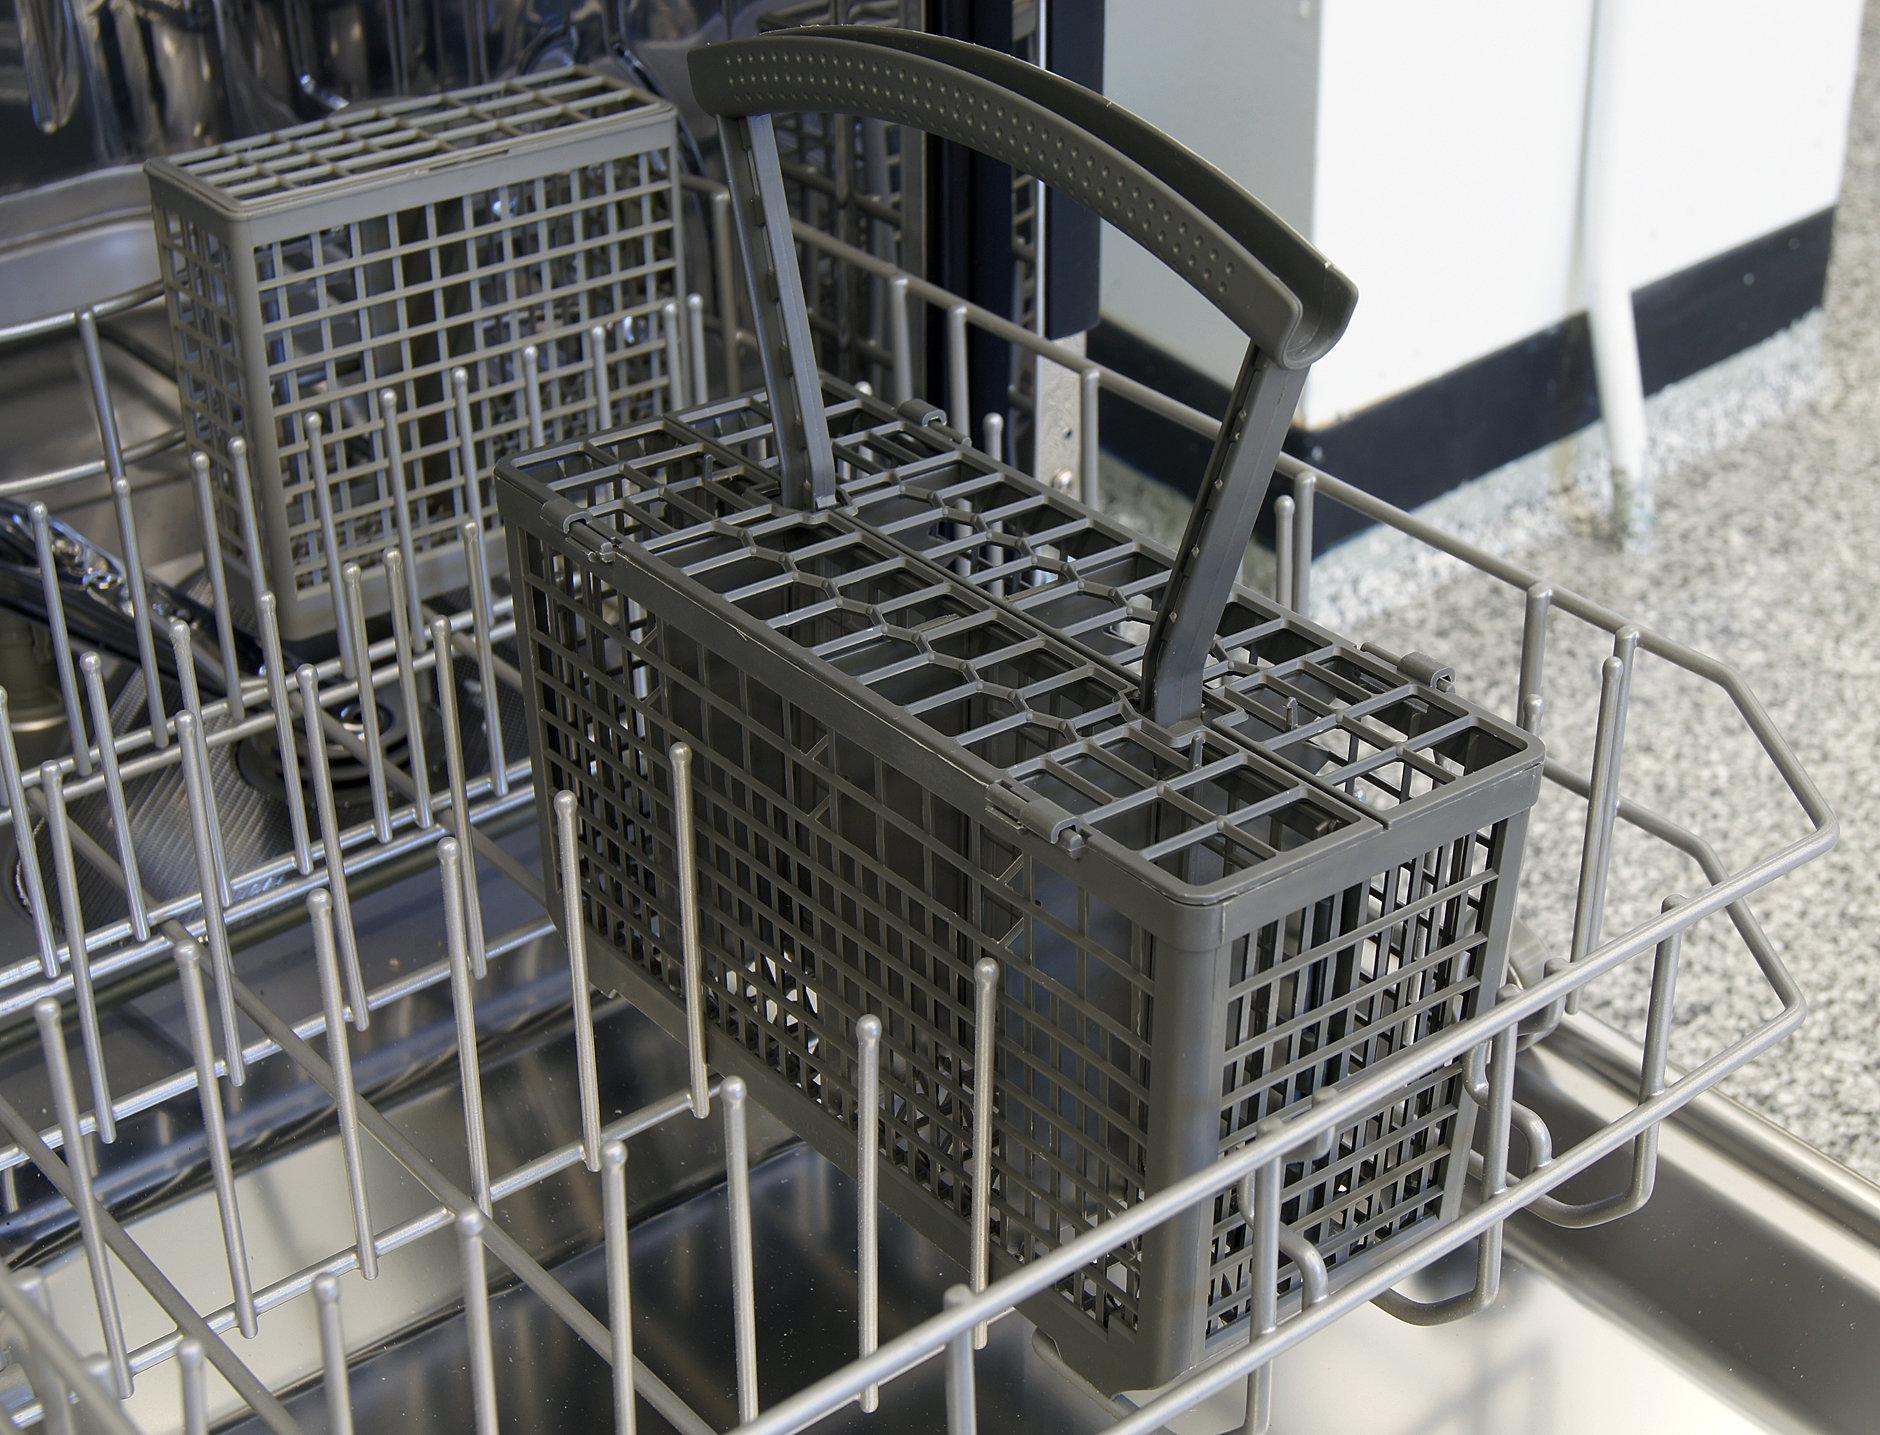 Kenmore Elite 14683 cutlery baskets